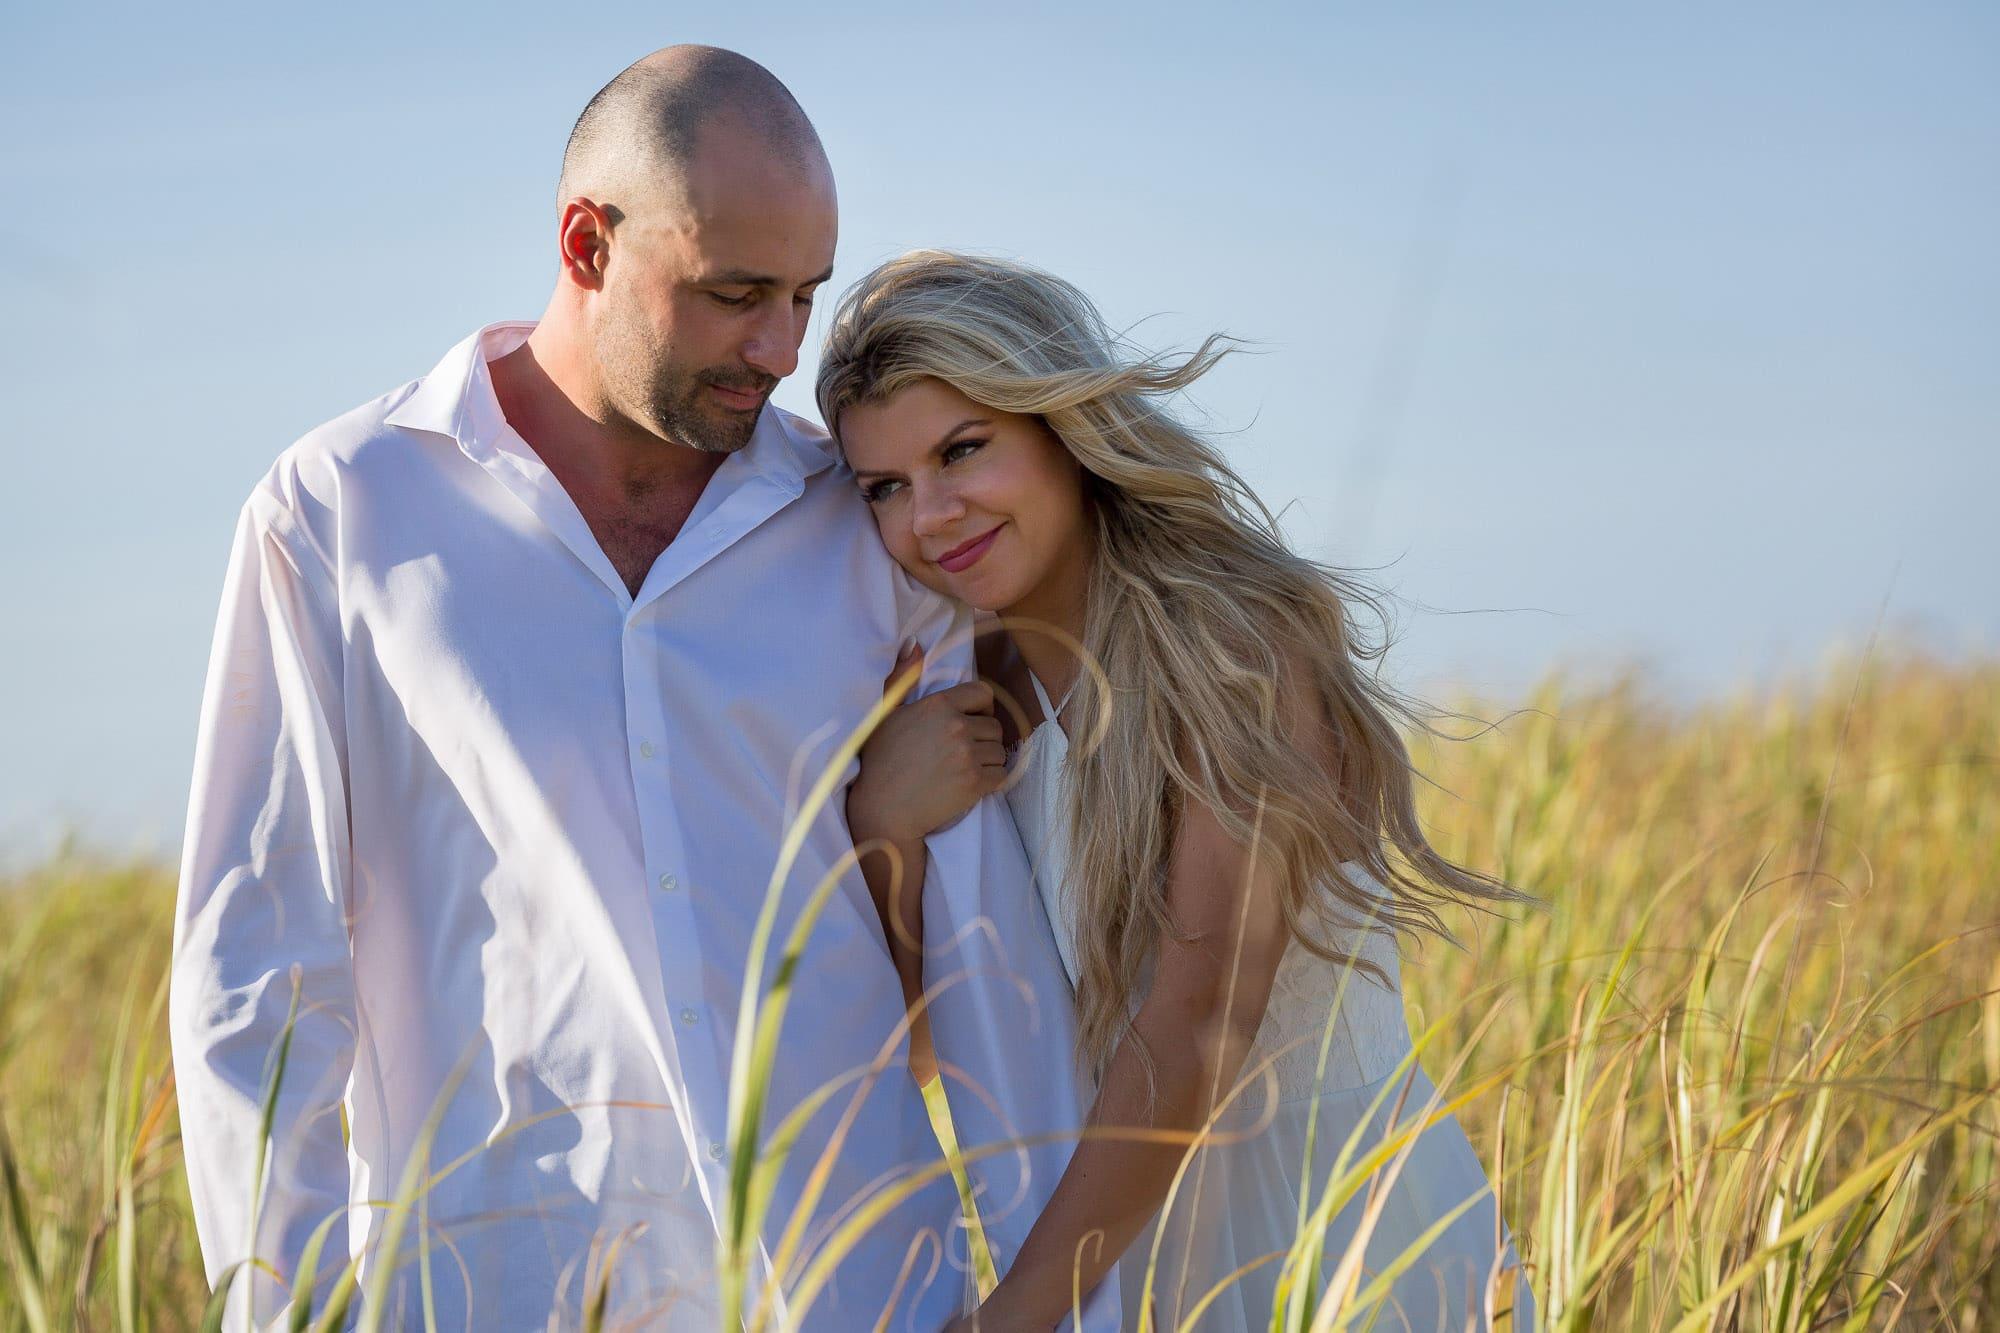 weddings at langosta beach club